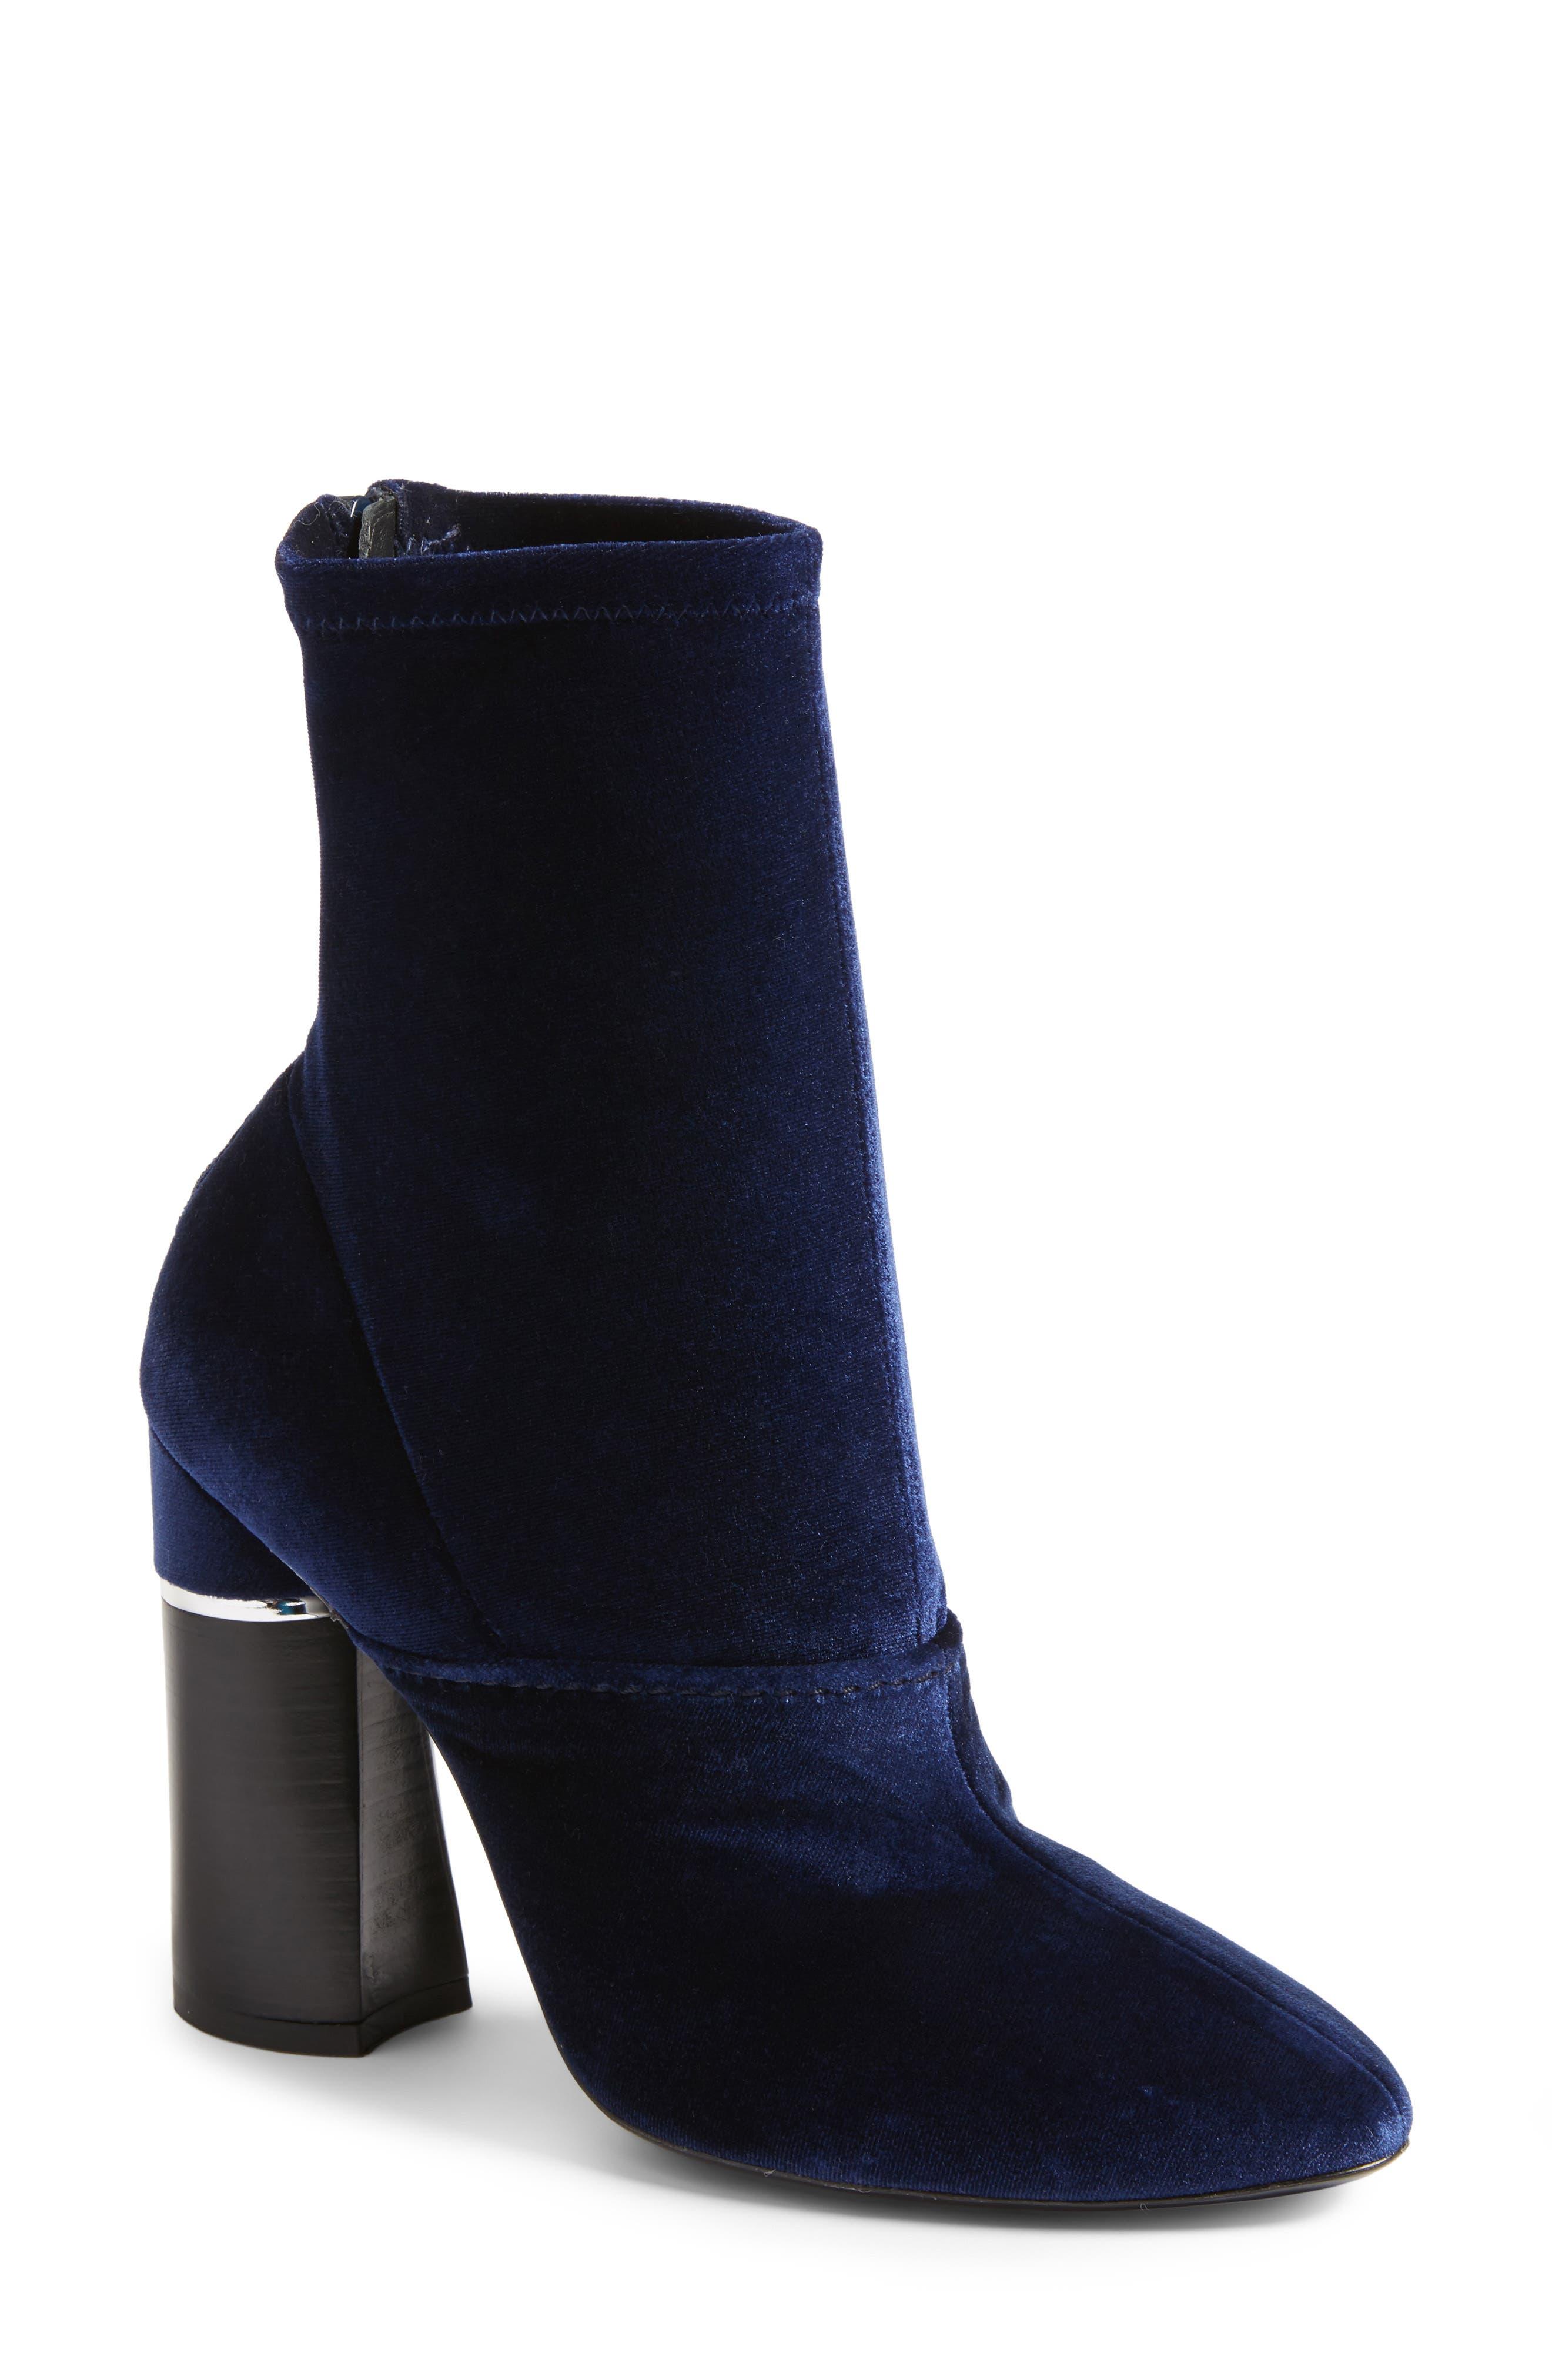 Main Image - 3.1 Phillip Lim 'Kyoto' Crushed Velvet Boot (Women)